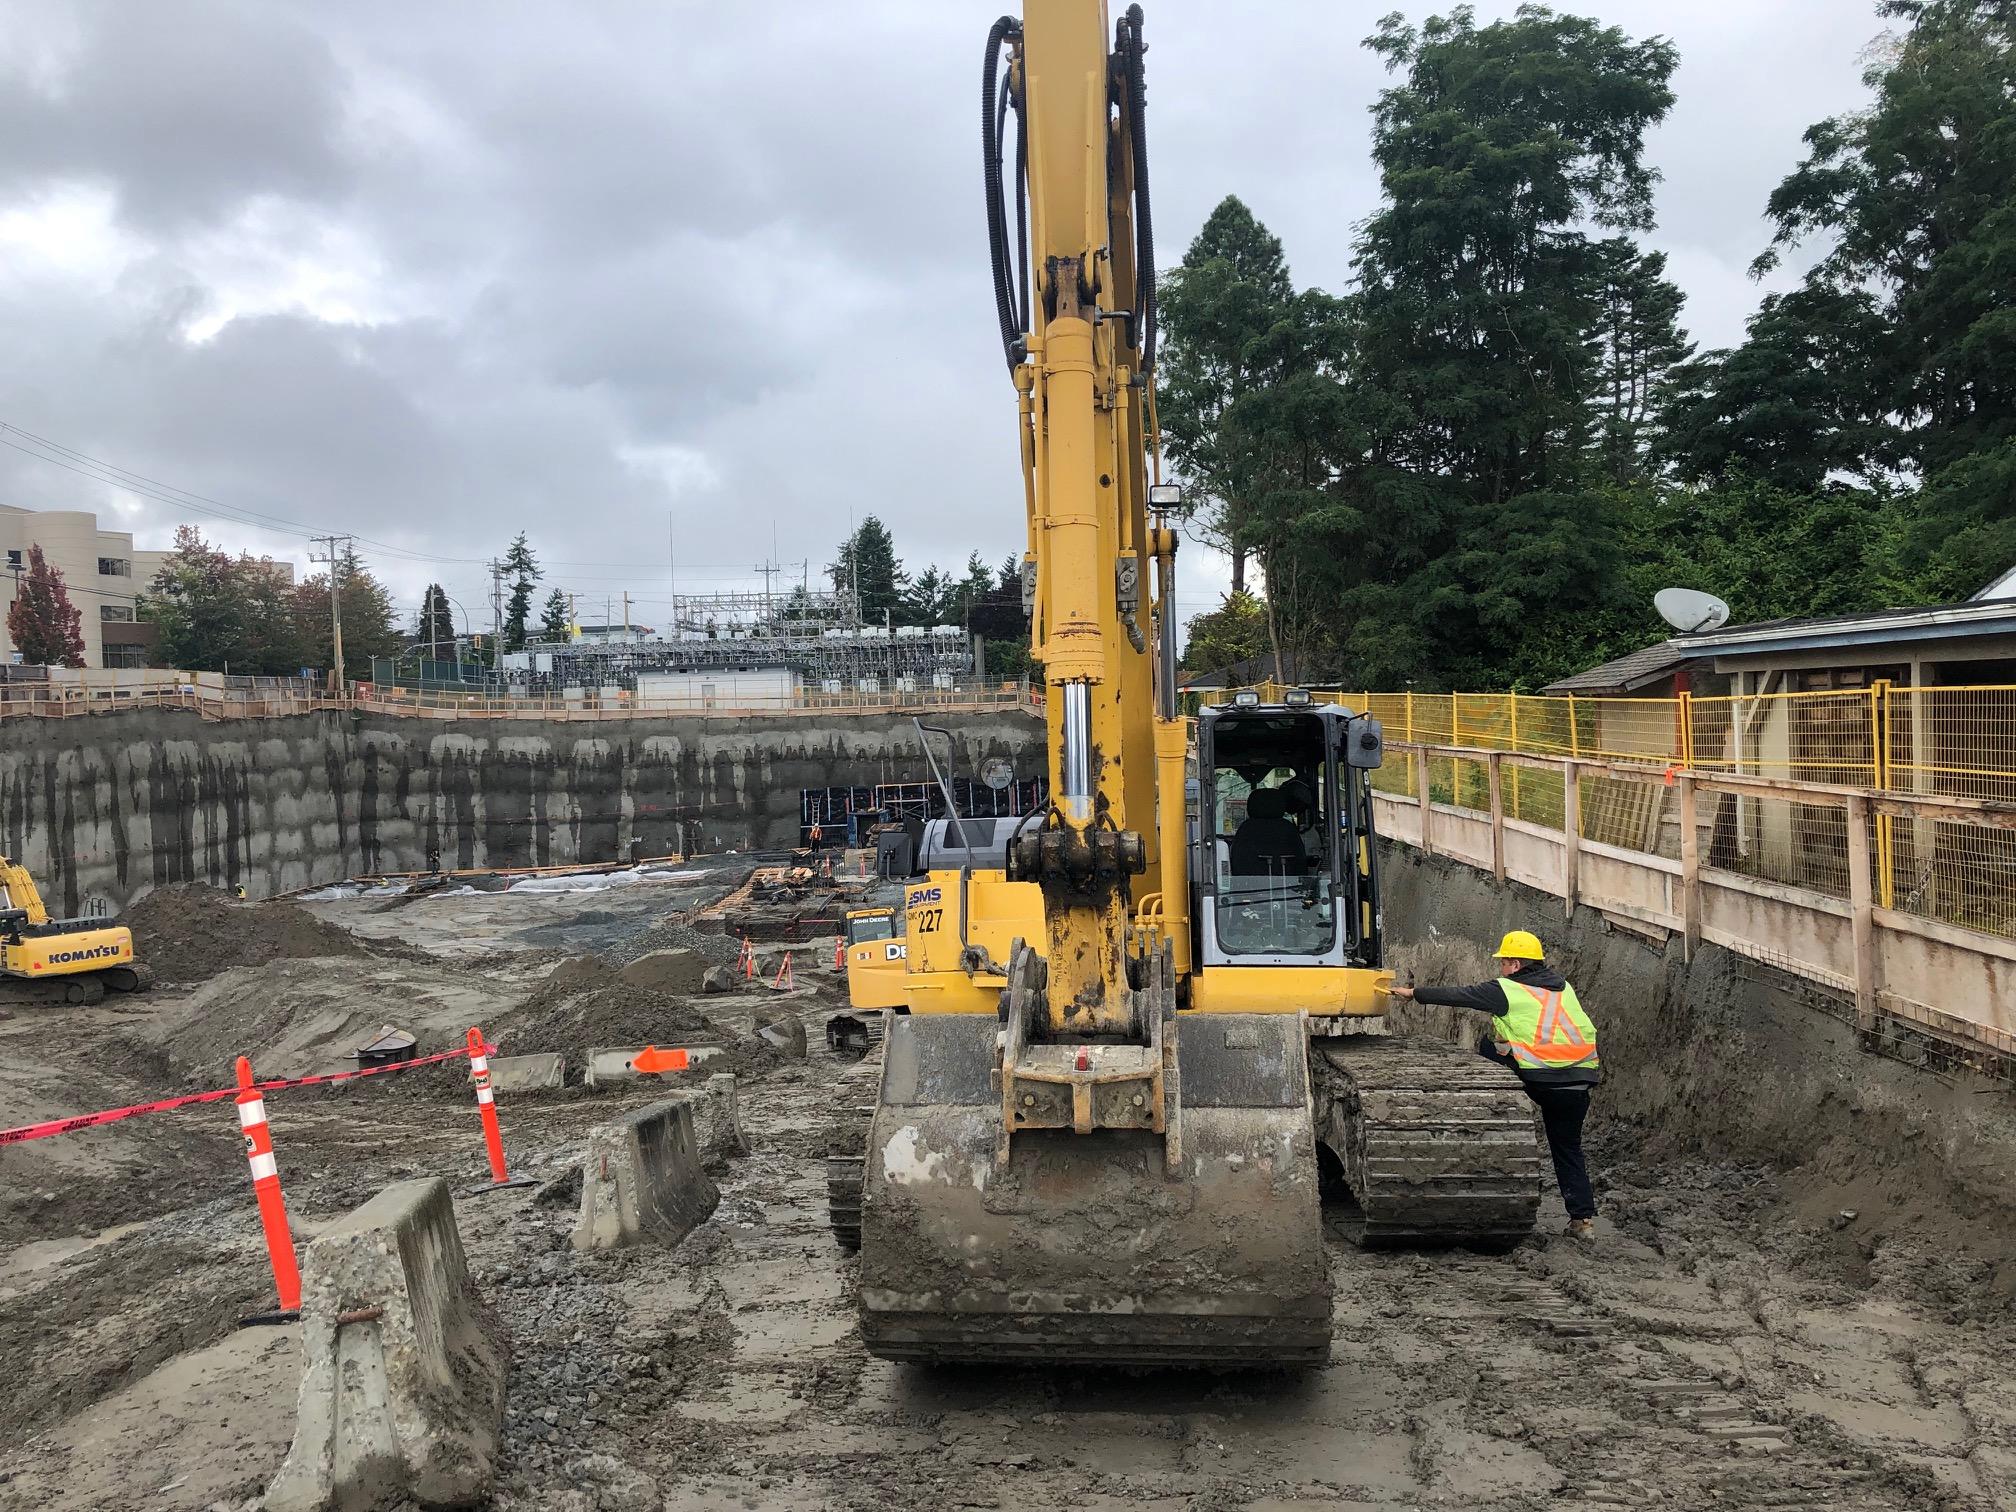 AltusWR_Construction2